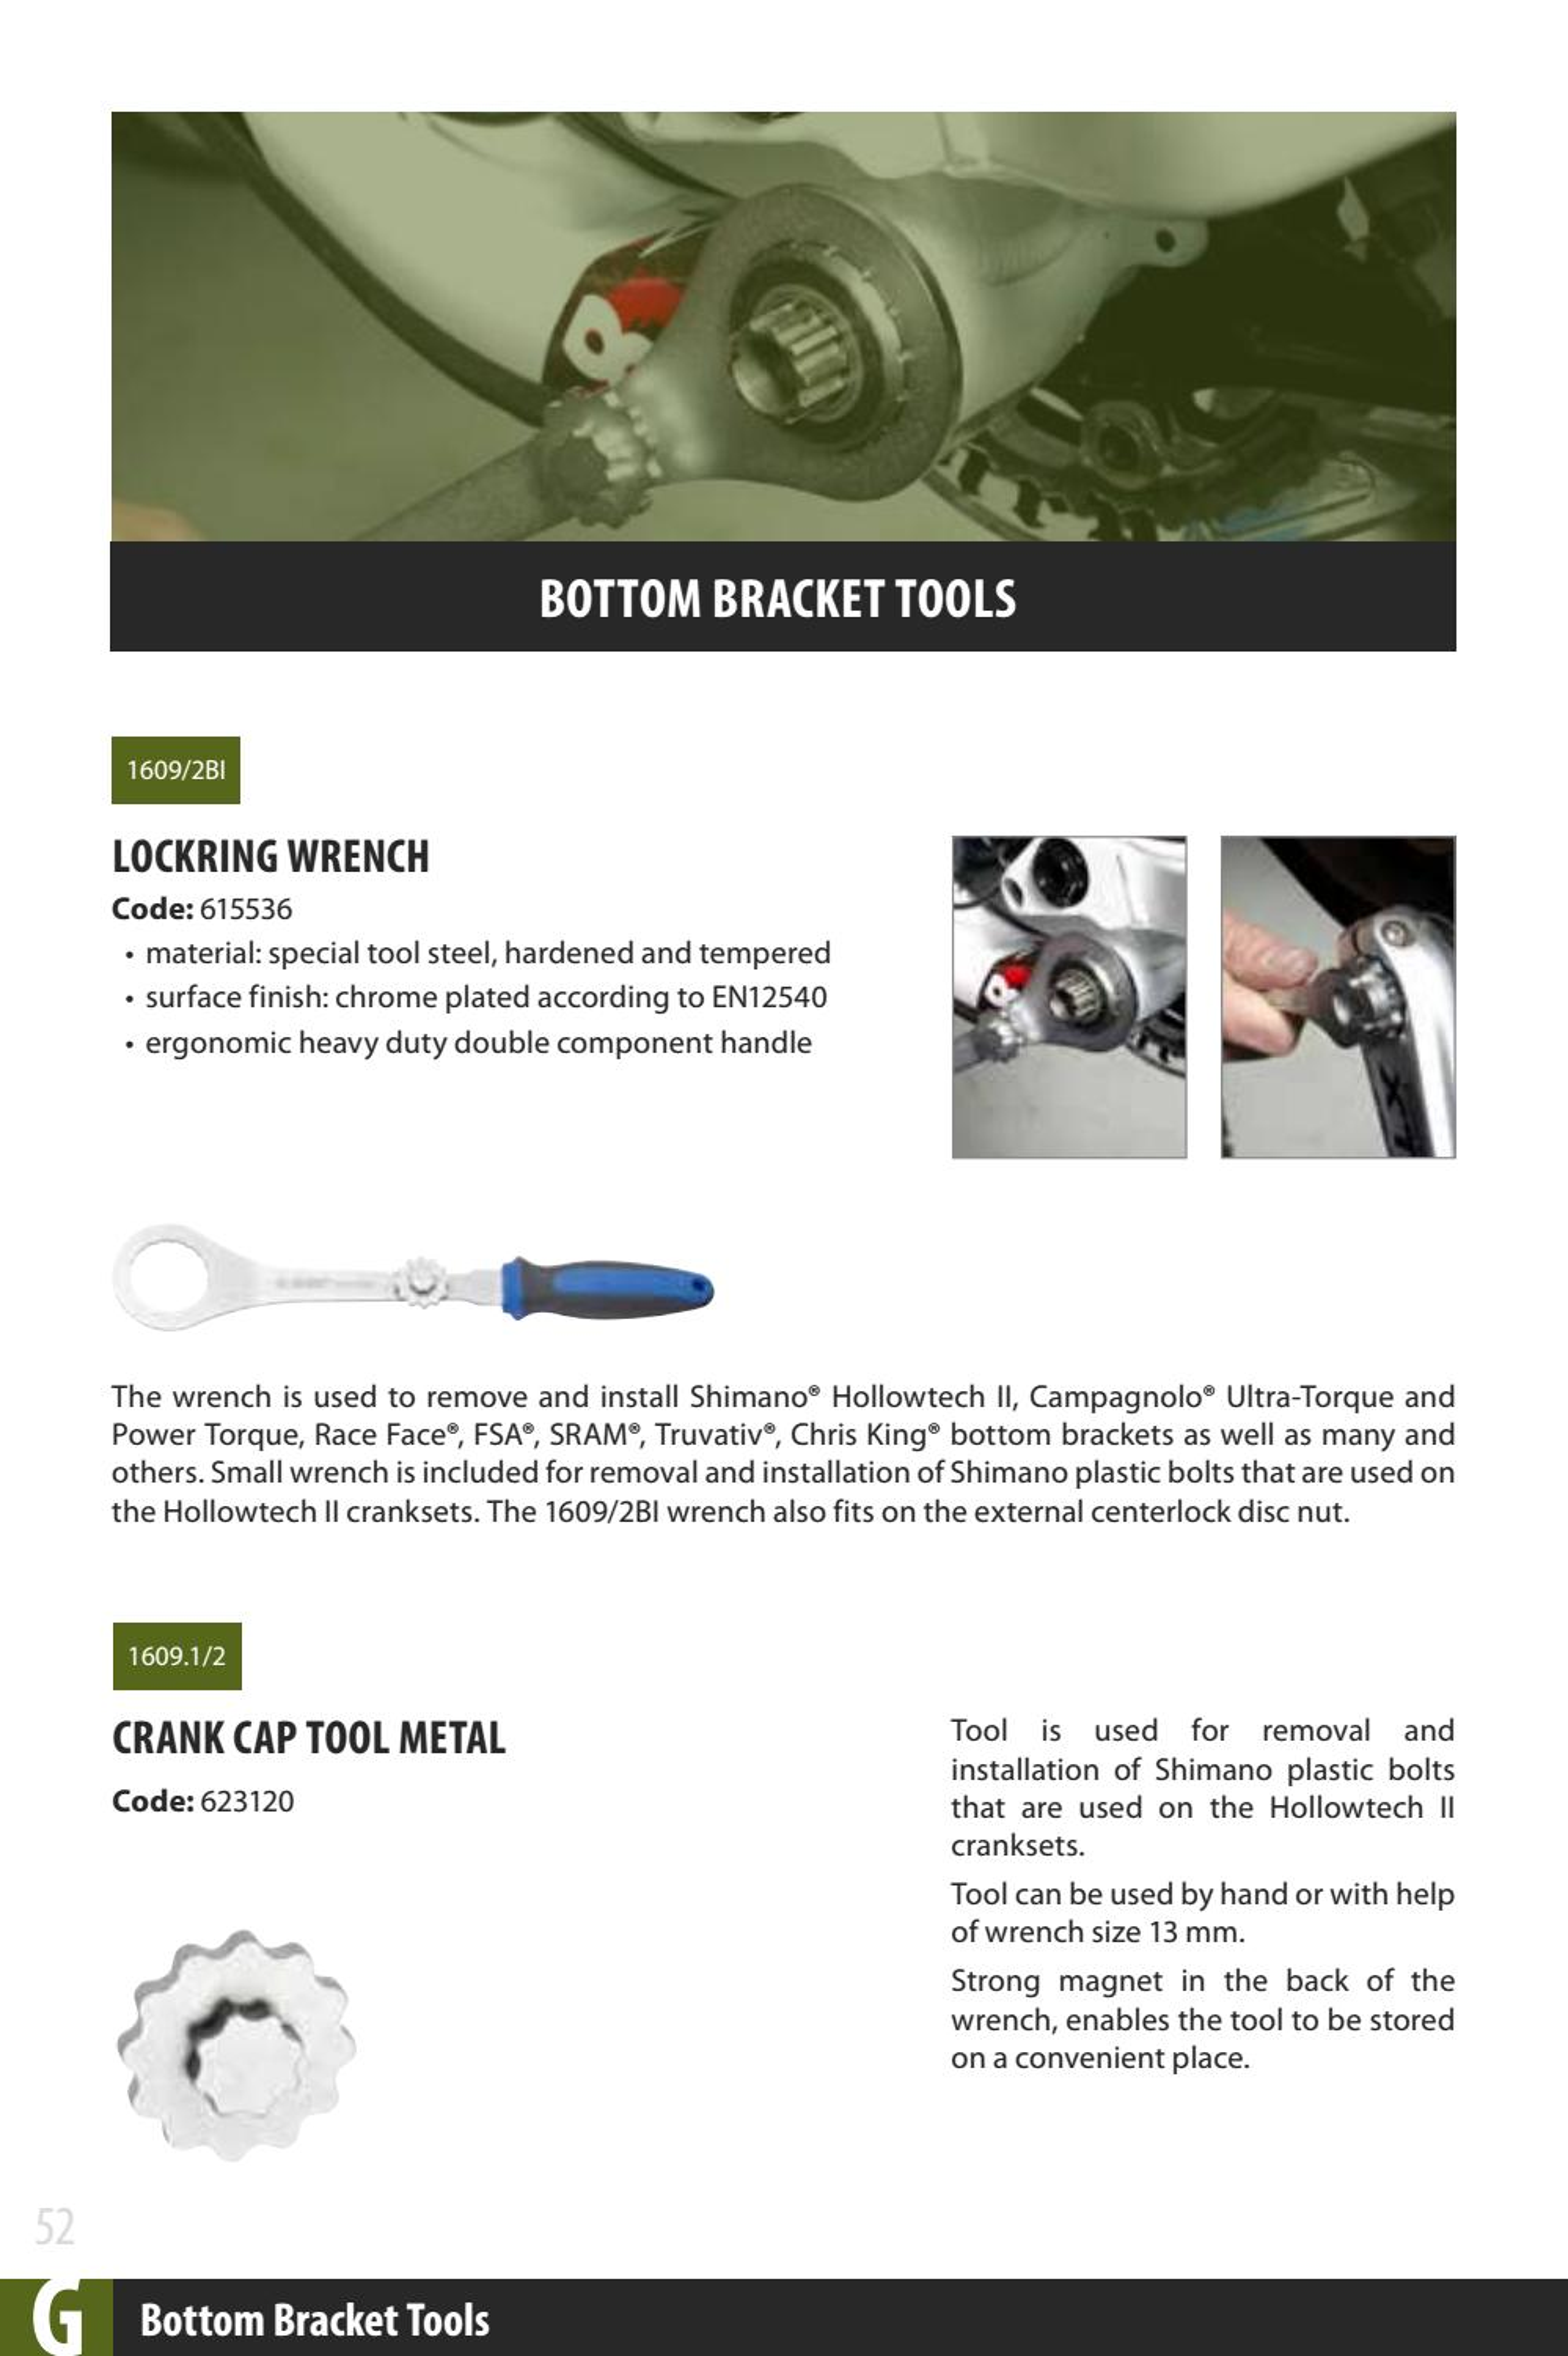 Unior bike tools catalogue en 2018 by Erik van Leeuwen - issuu